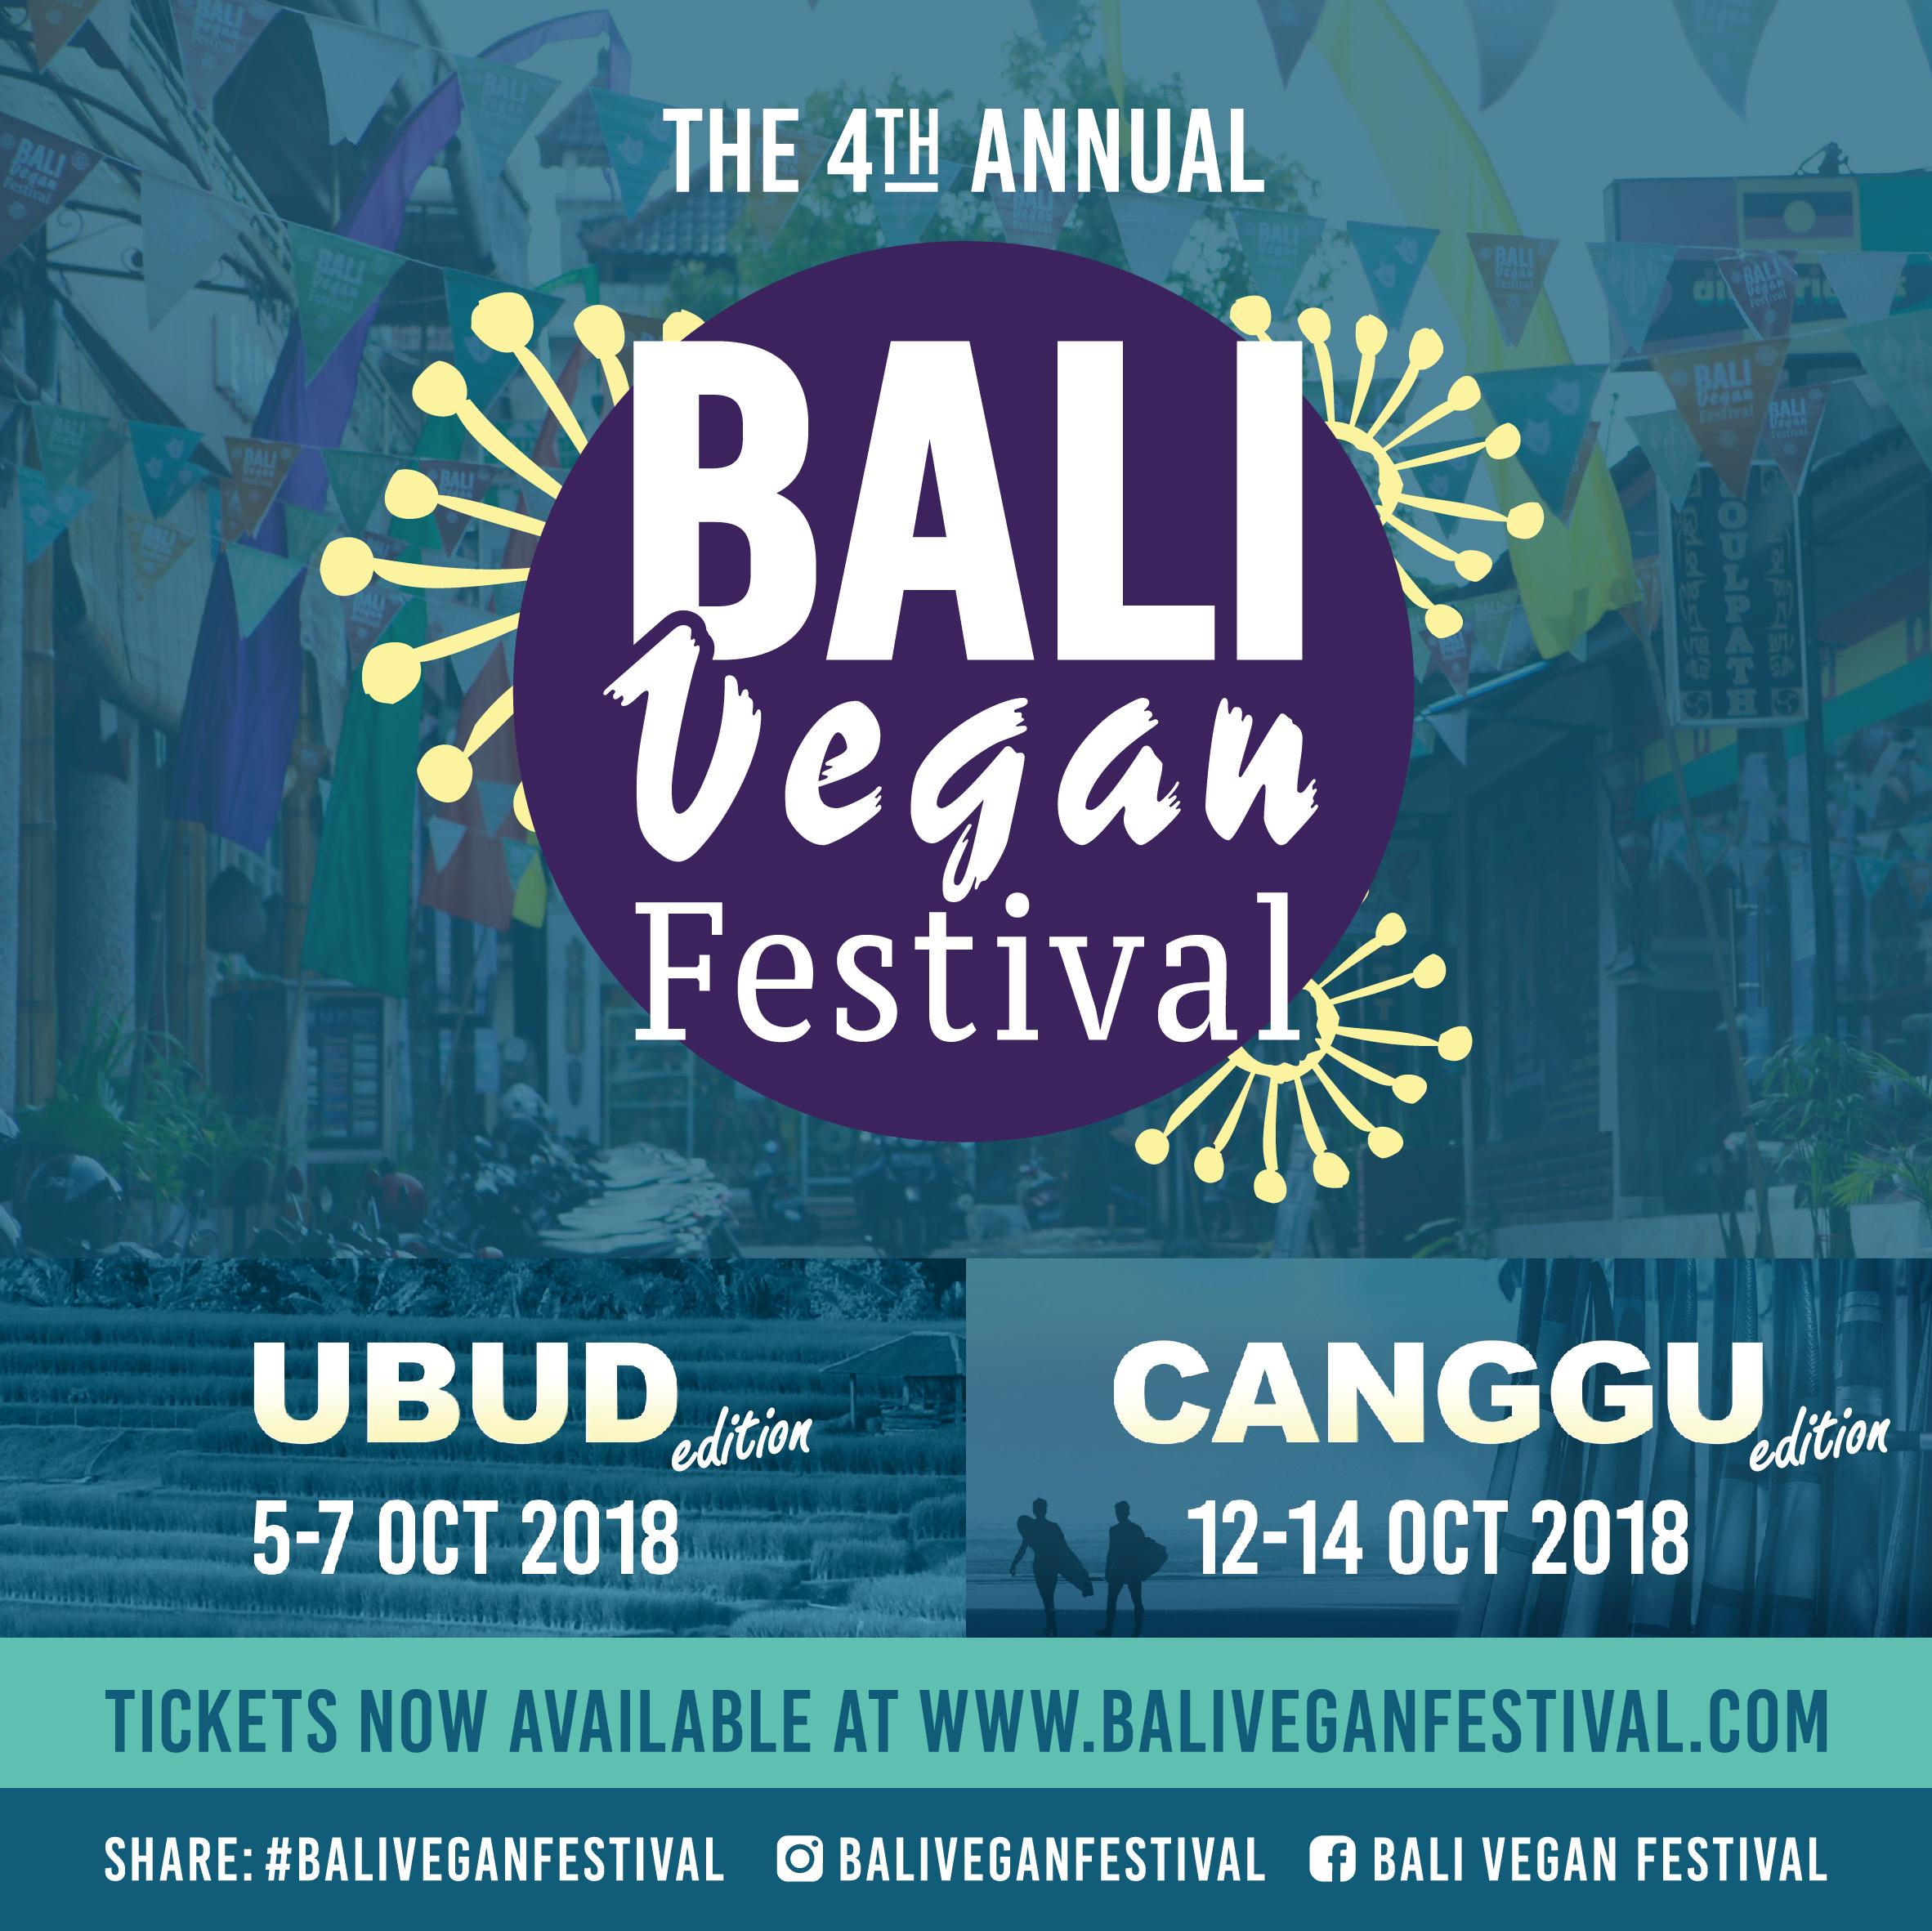 vegan, Canggu, Ubud, Bali, Indonesia, summer, gluten free, cider